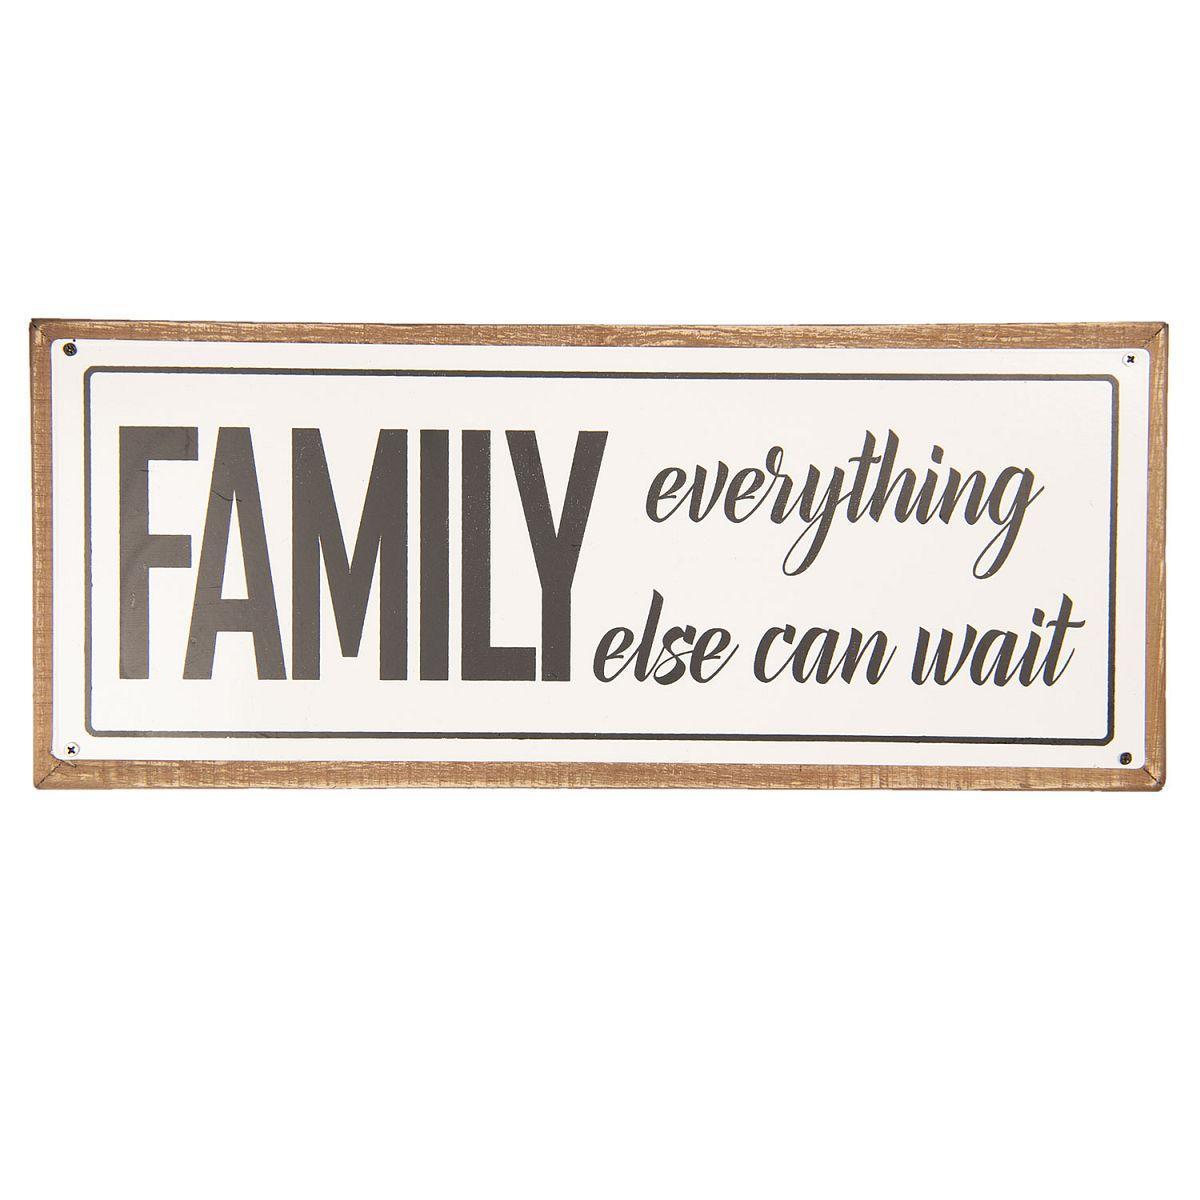 Cedule FAMILY